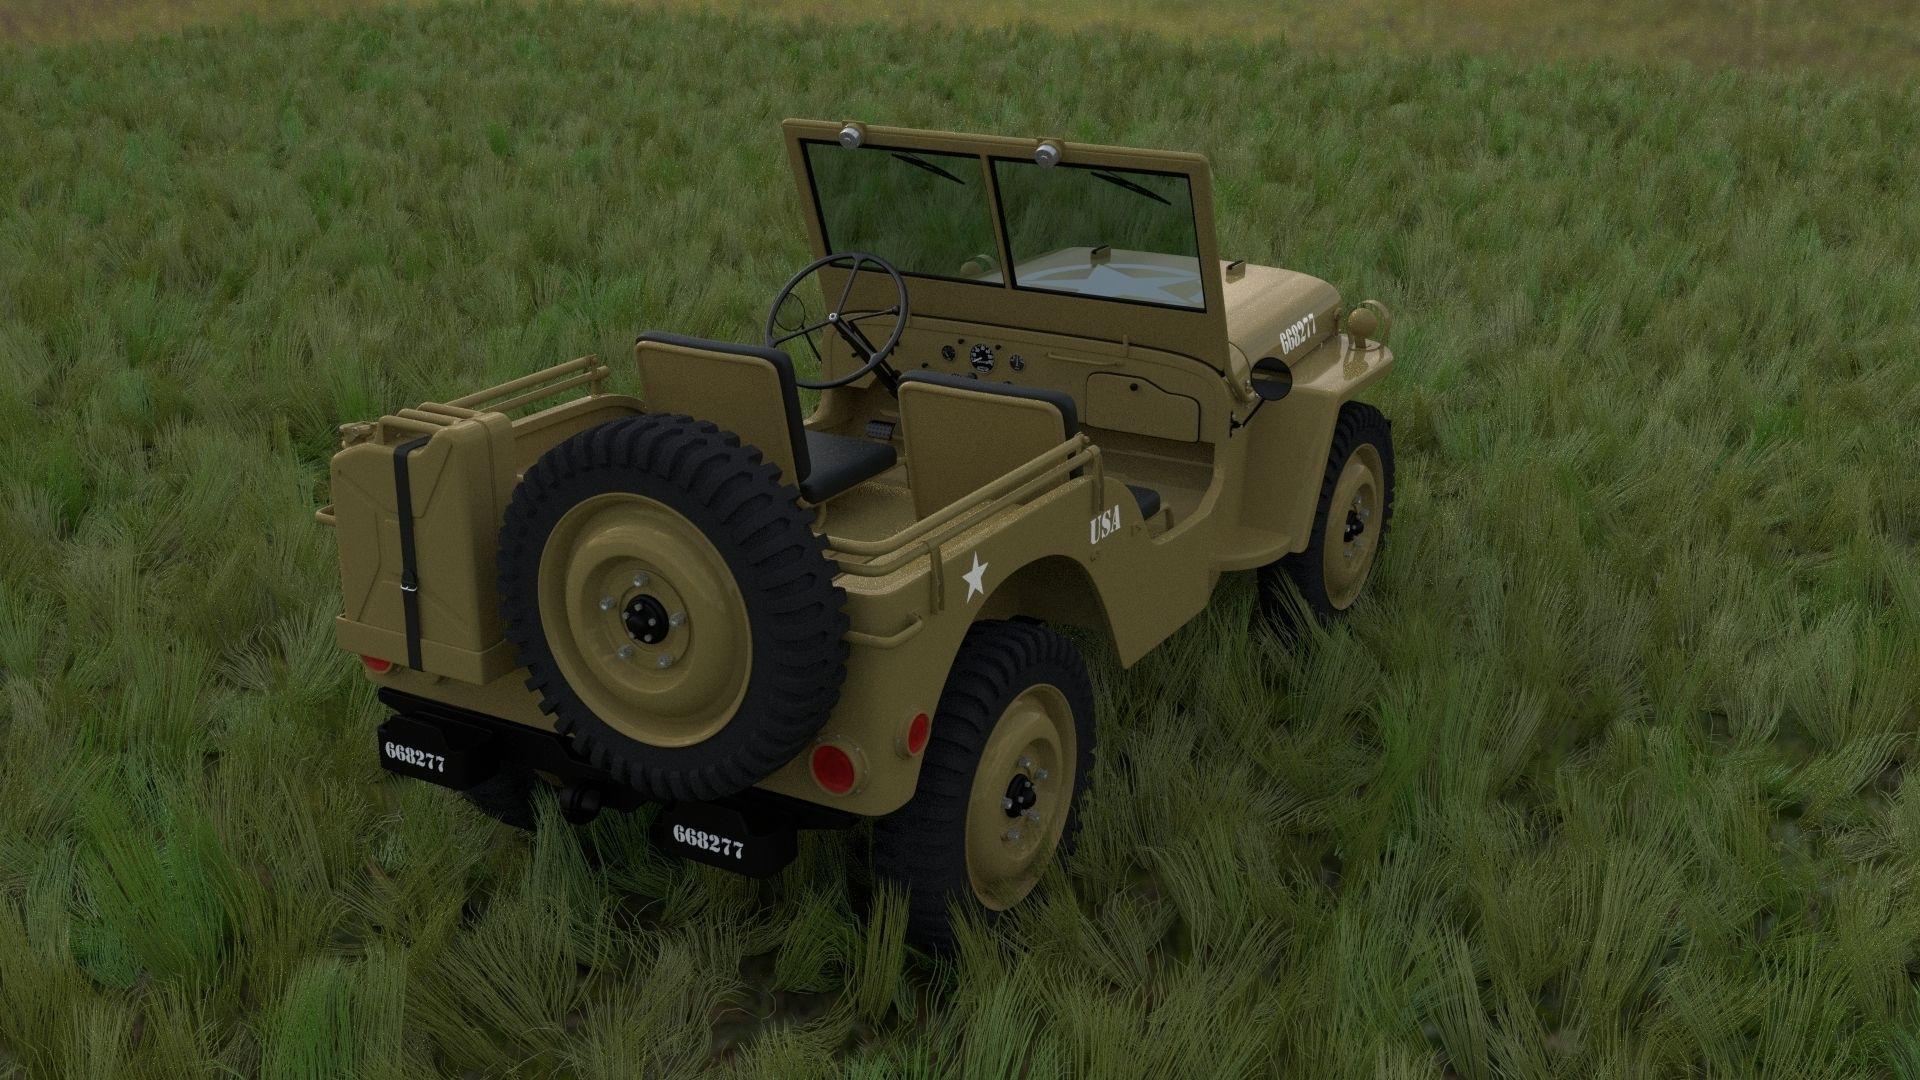 full w chassis jeep willys mb military desert hdri 3d model obj fbx stl blend dae mtl. Black Bedroom Furniture Sets. Home Design Ideas